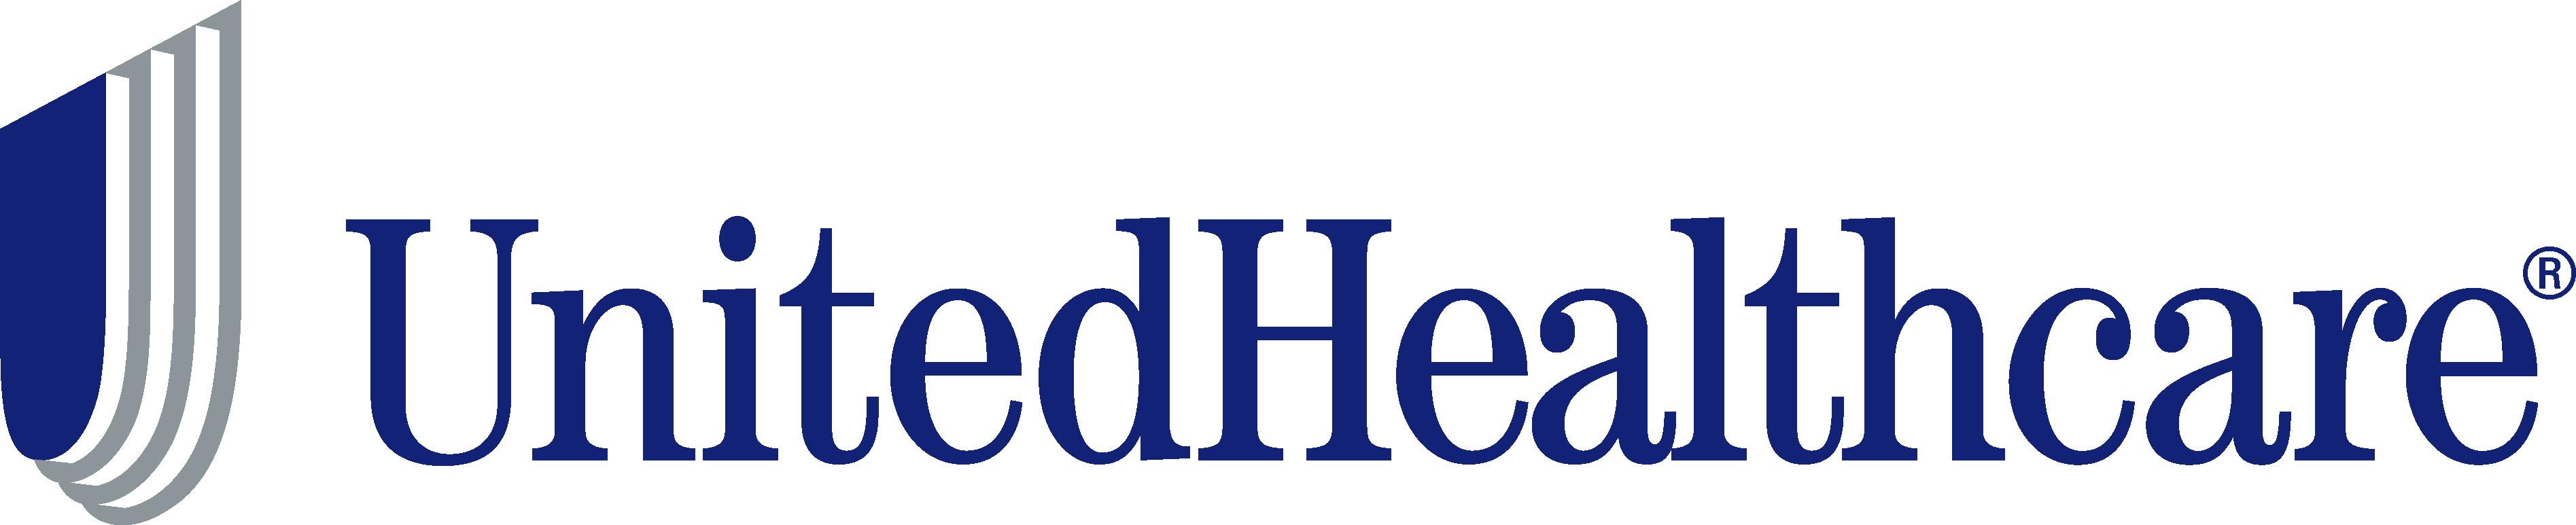 unitedhealthcare Logo